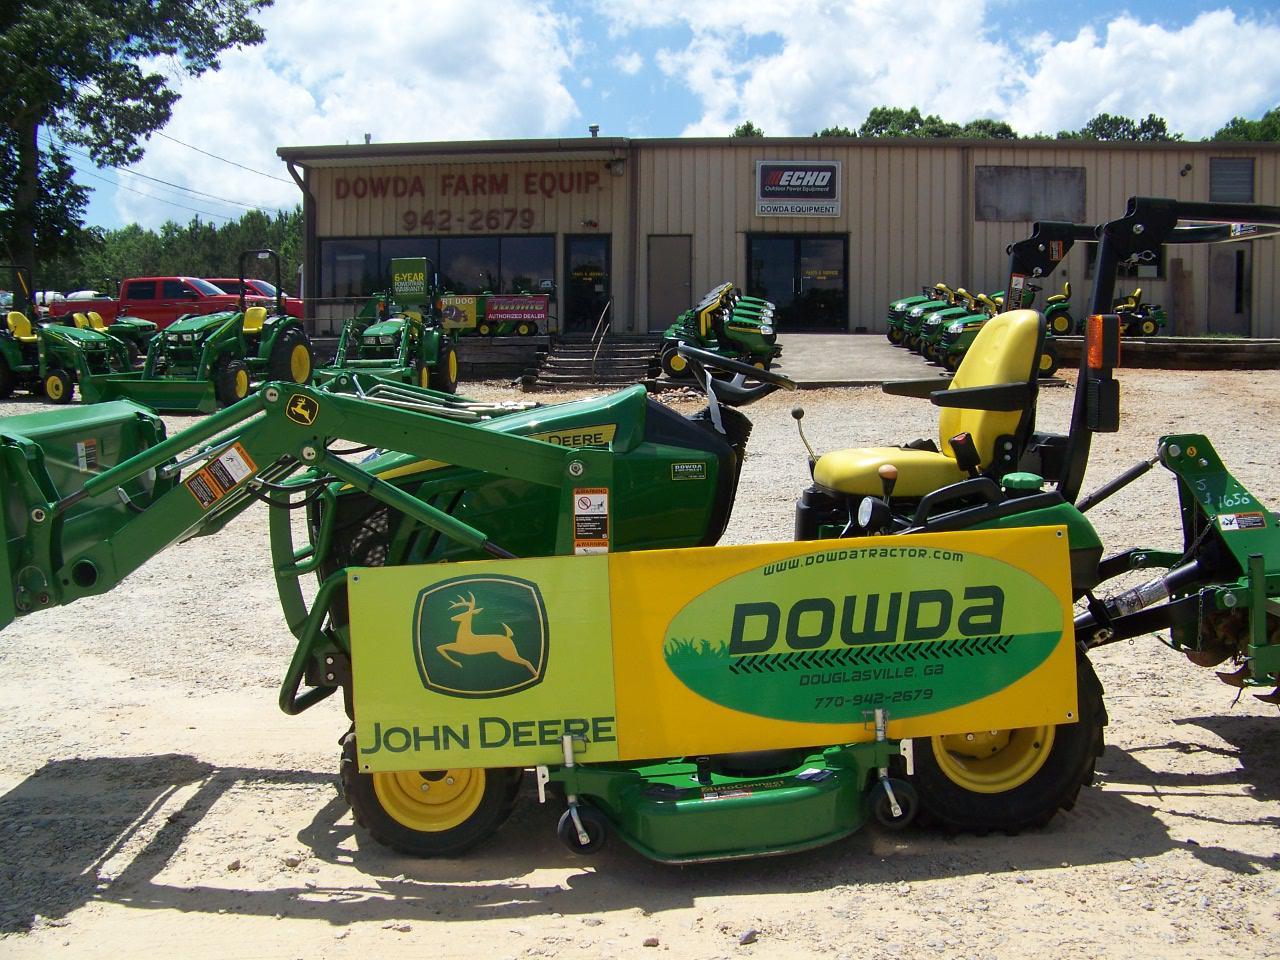 Inventory Dowda Farm Equipment Inc  Douglasville, GA (770